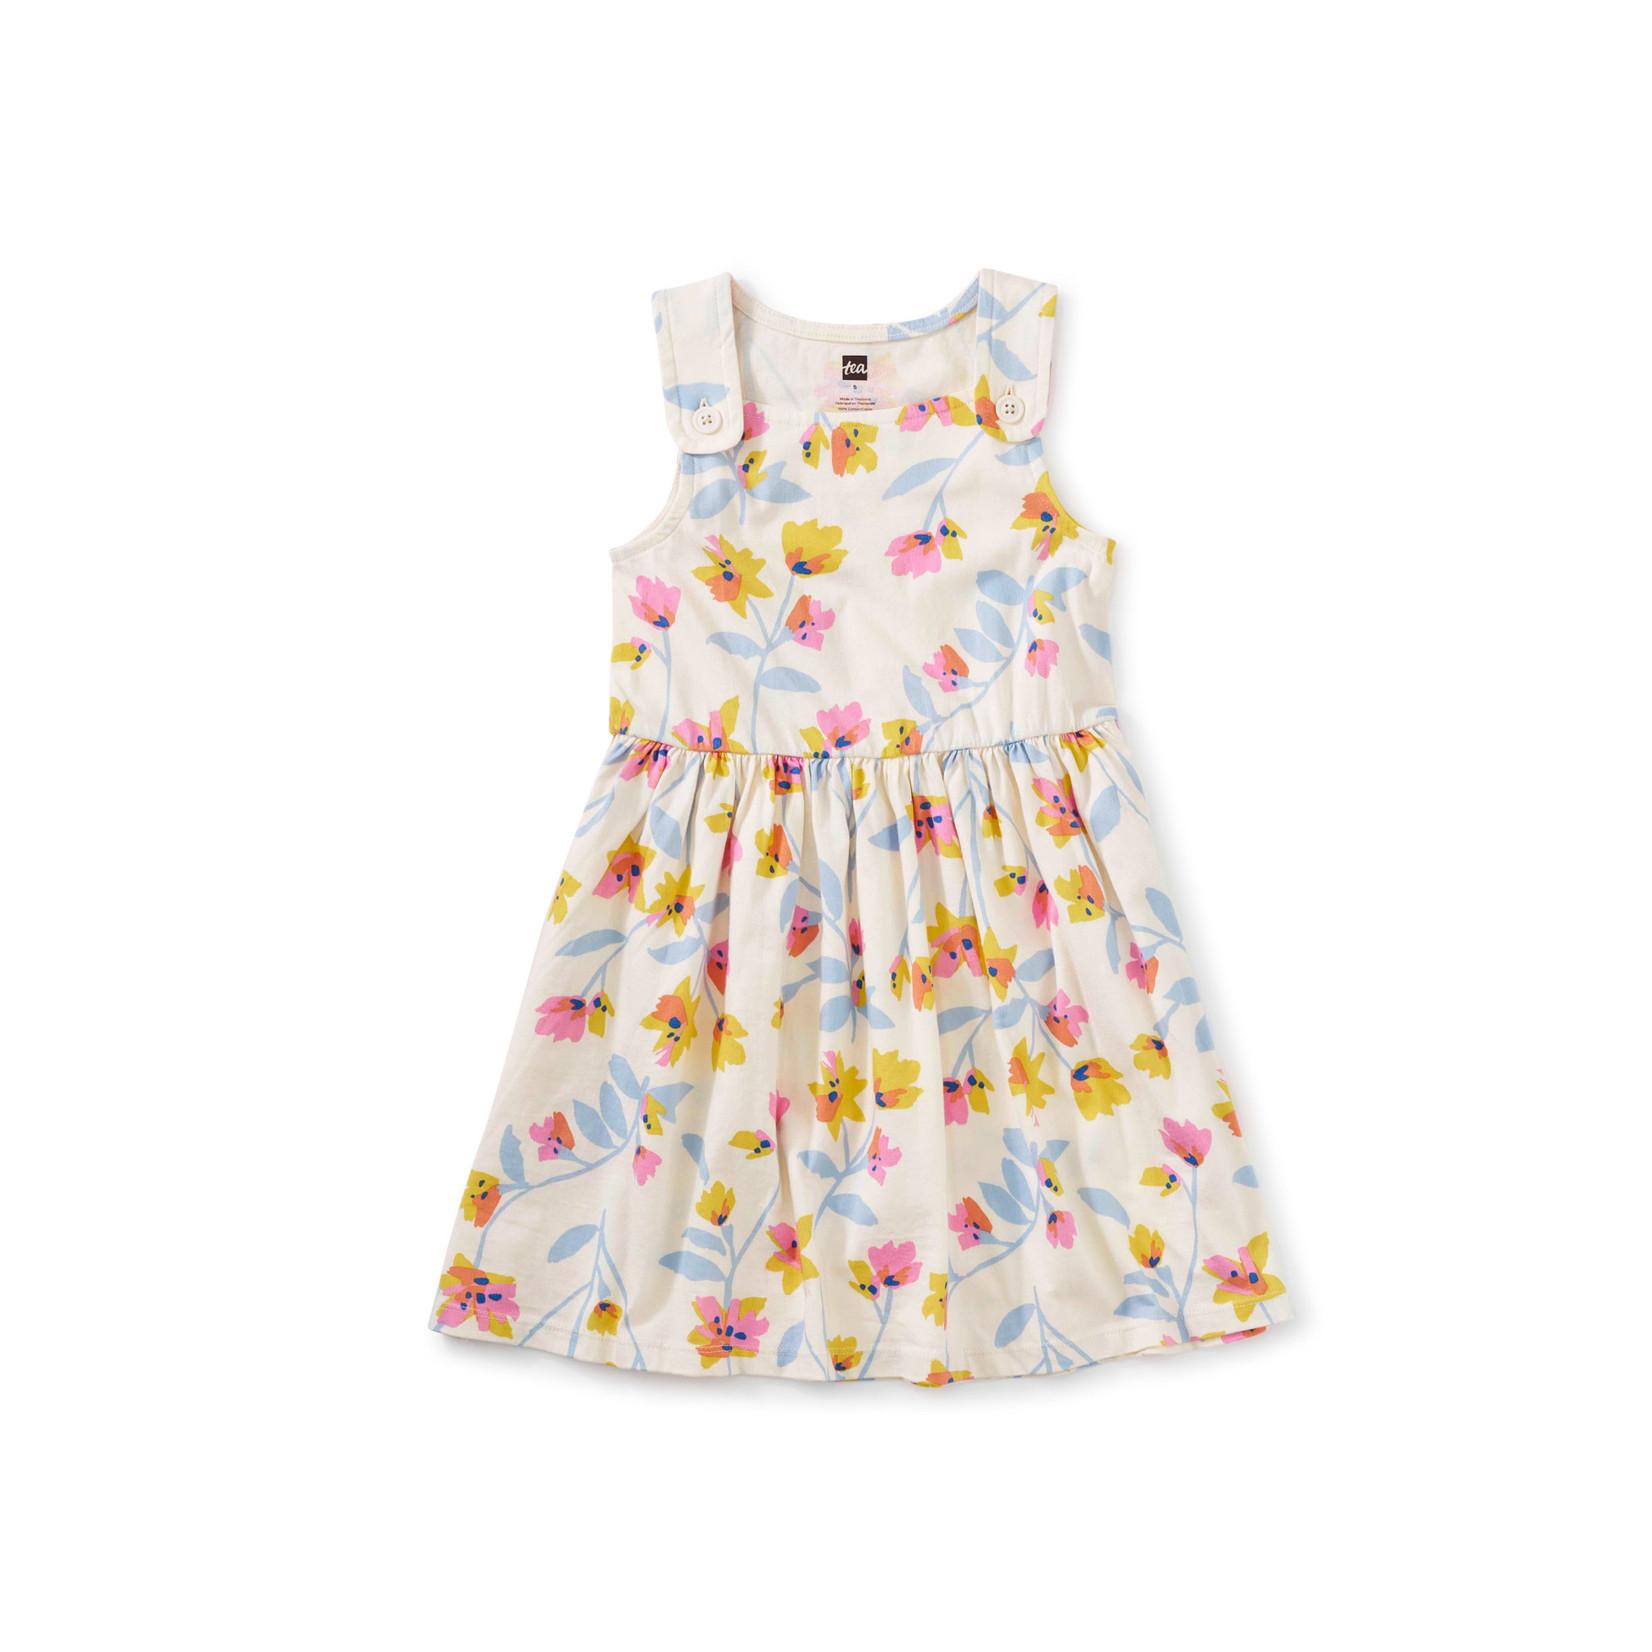 Tea Collection Button Shoulder Dress - Costa Nova Flora